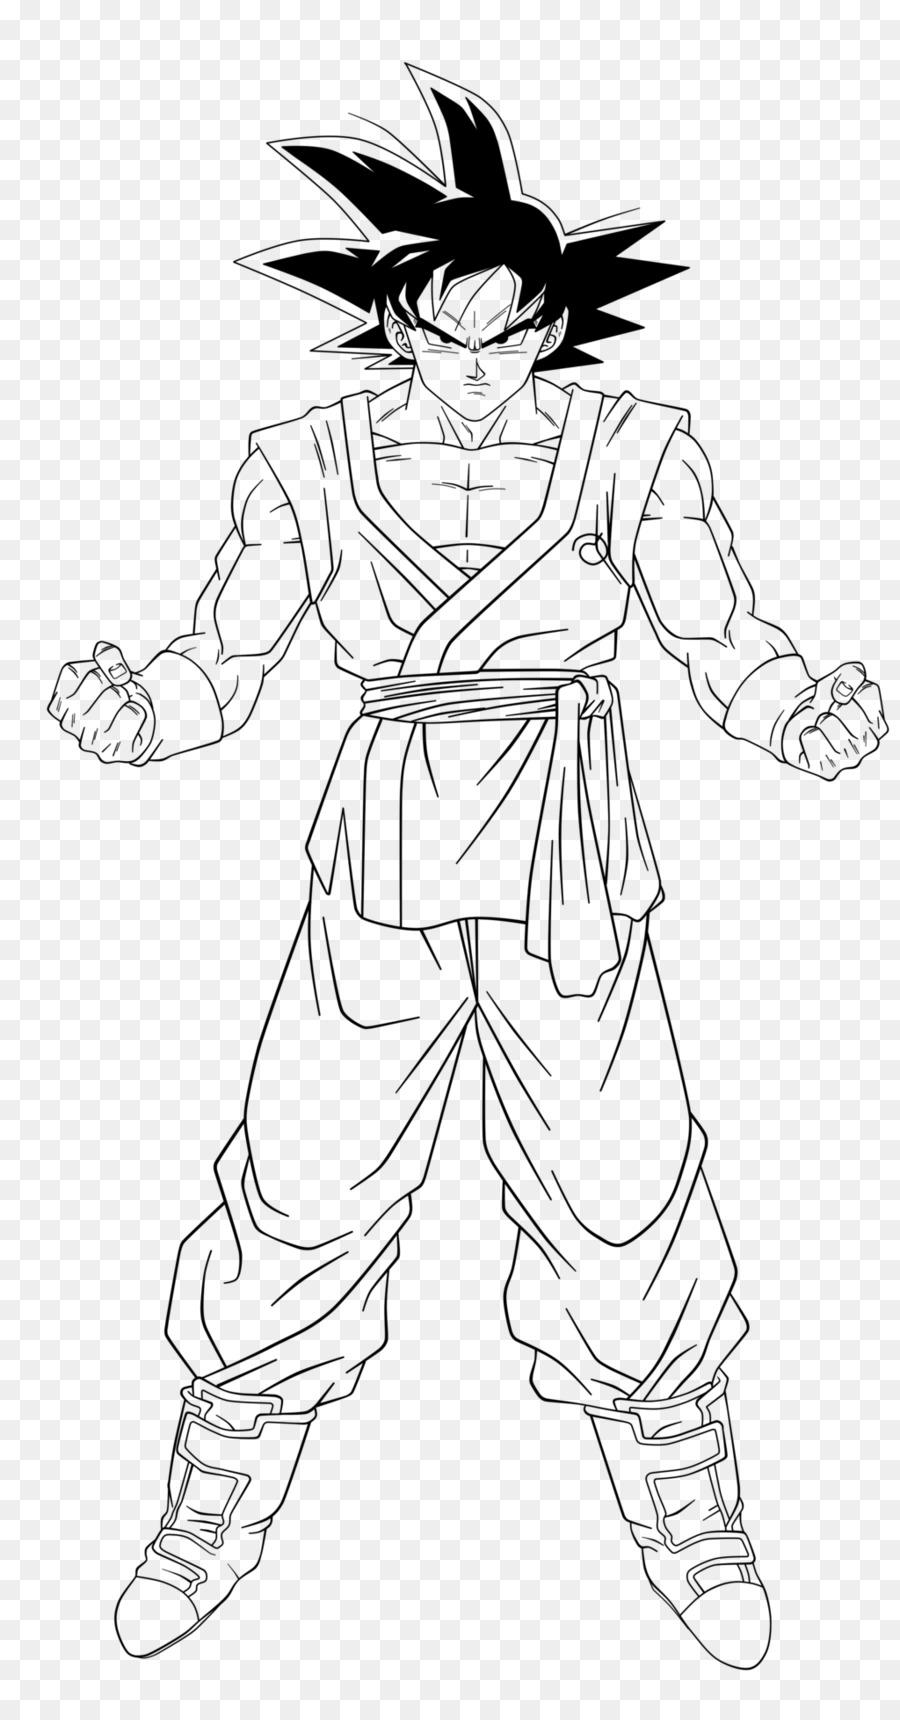 Goku Line Art Vegeta Drawing Tattoo Goku Png Download 1024 1938